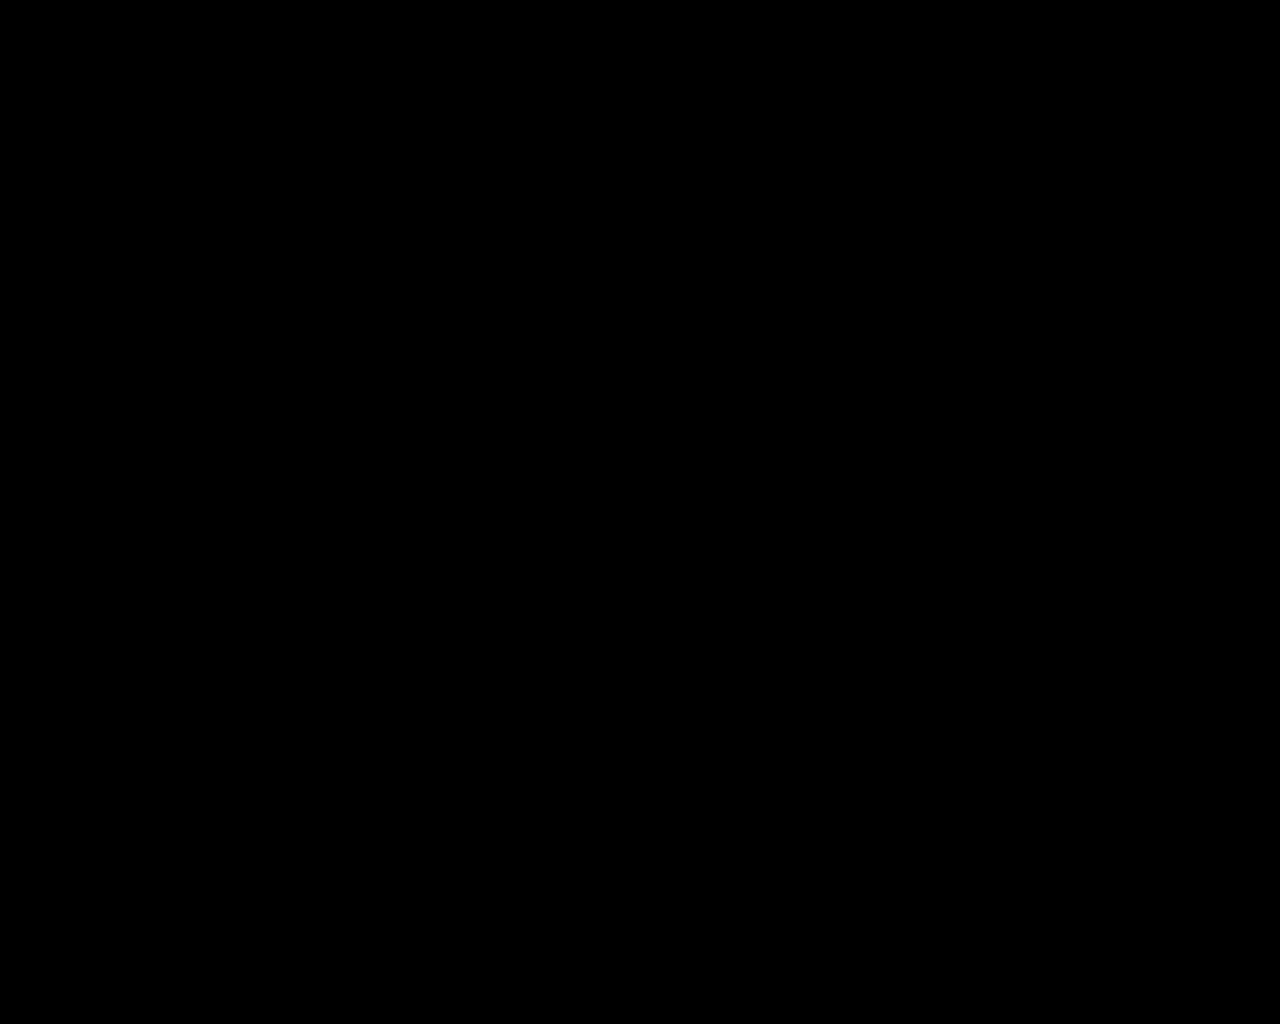 Plain Black Background 29 Hd Wallpaper   Hdblackwallpapercom 1280x1024